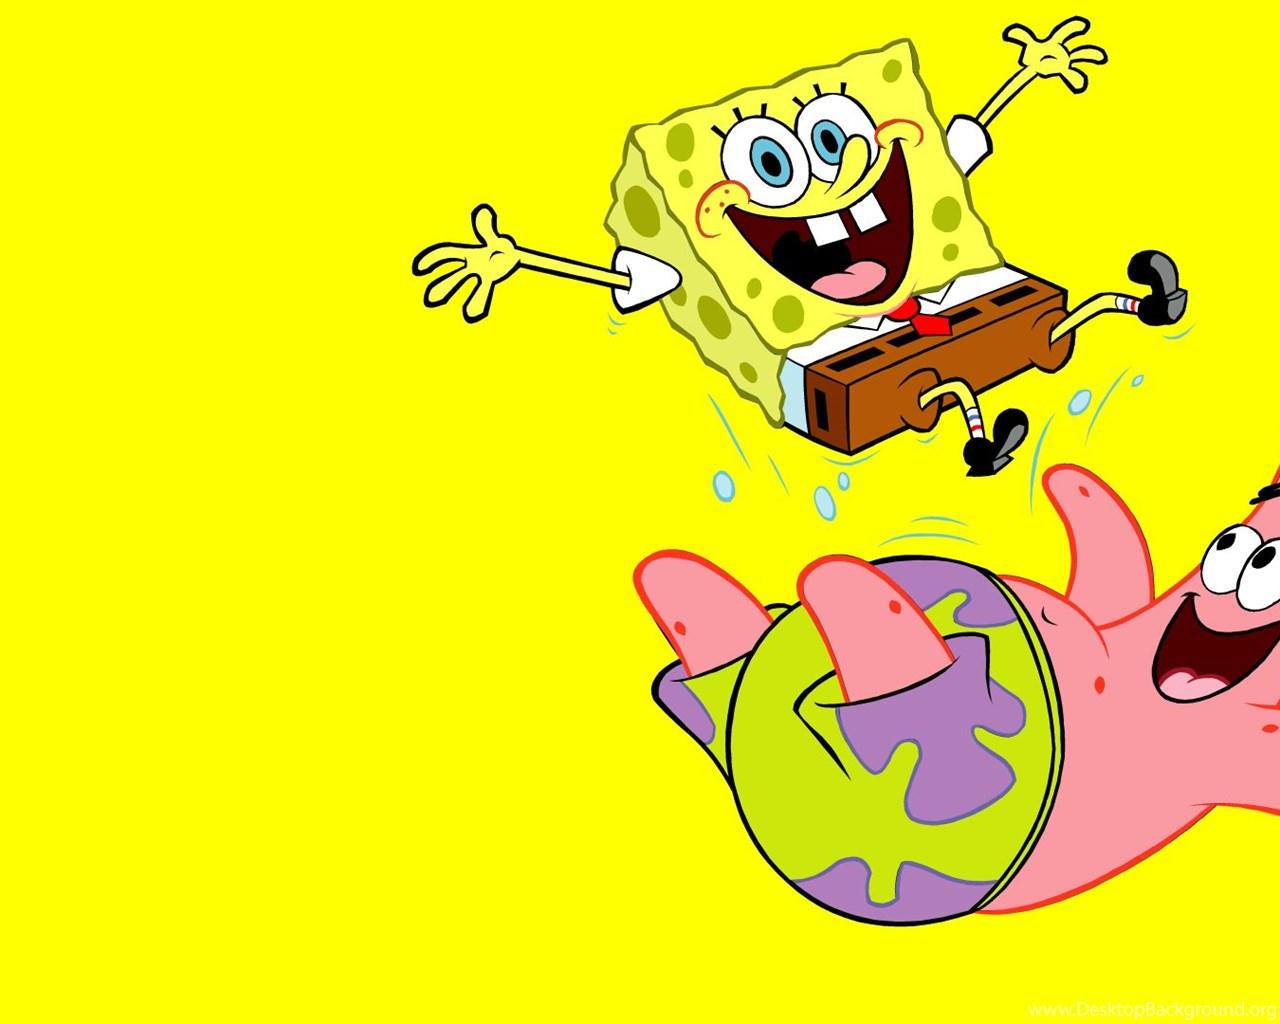 High Resolution Spongebob Squarepants Wallpapers HD 22 ...